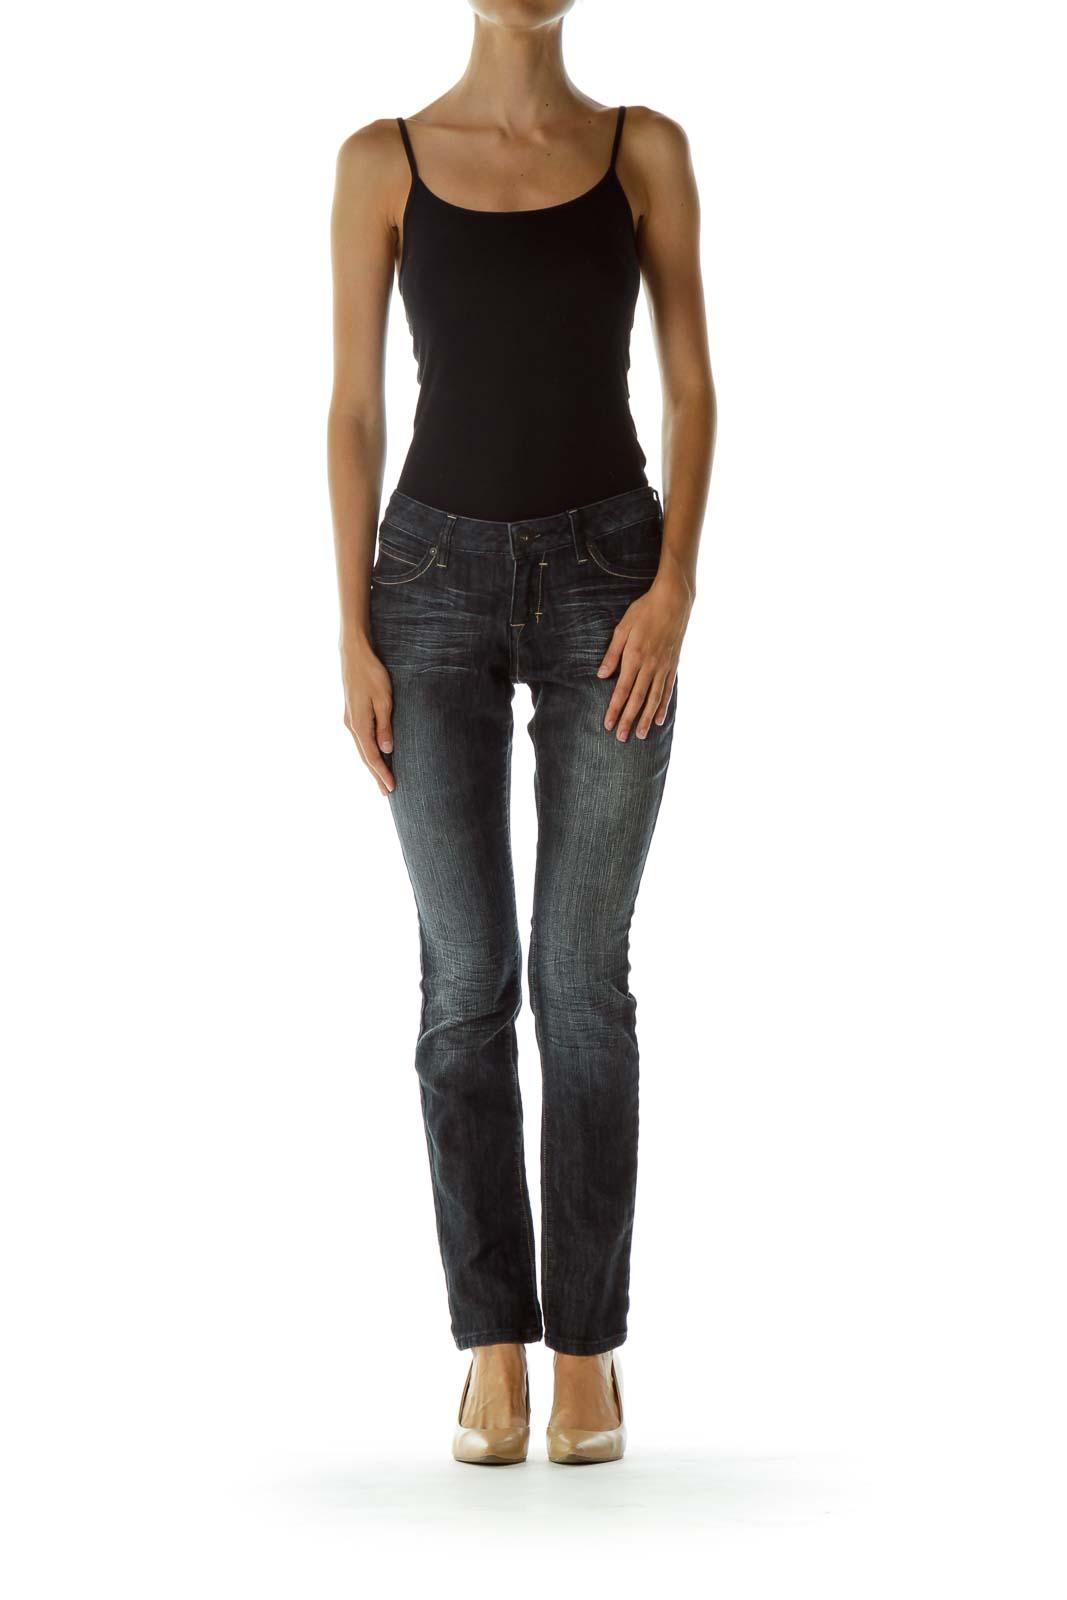 Black Gray Pocketed Skinny Jeans